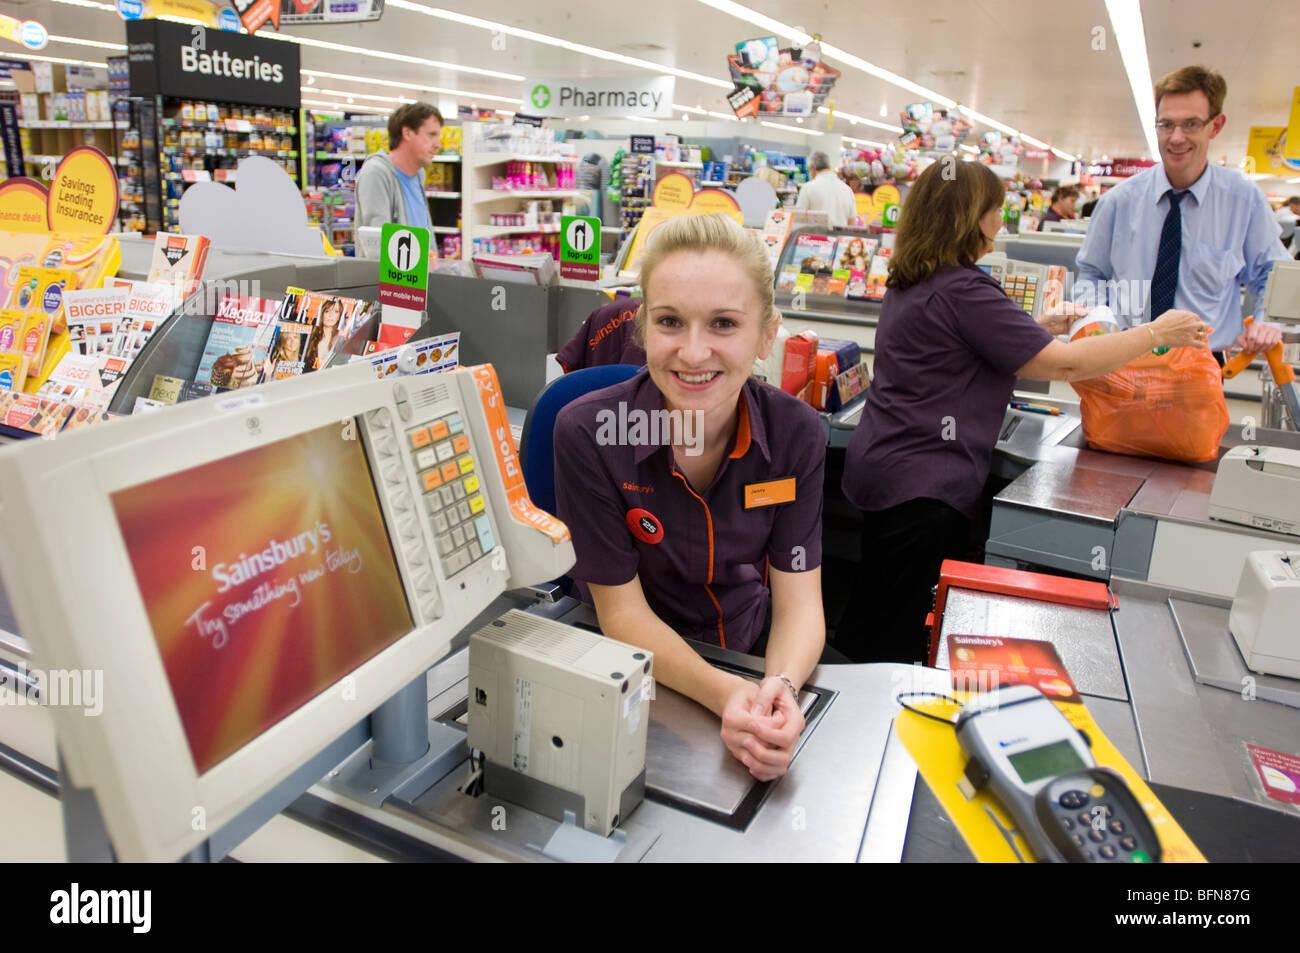 sainsbury 39 s supermarket smiling girl in uniform at the. Black Bedroom Furniture Sets. Home Design Ideas